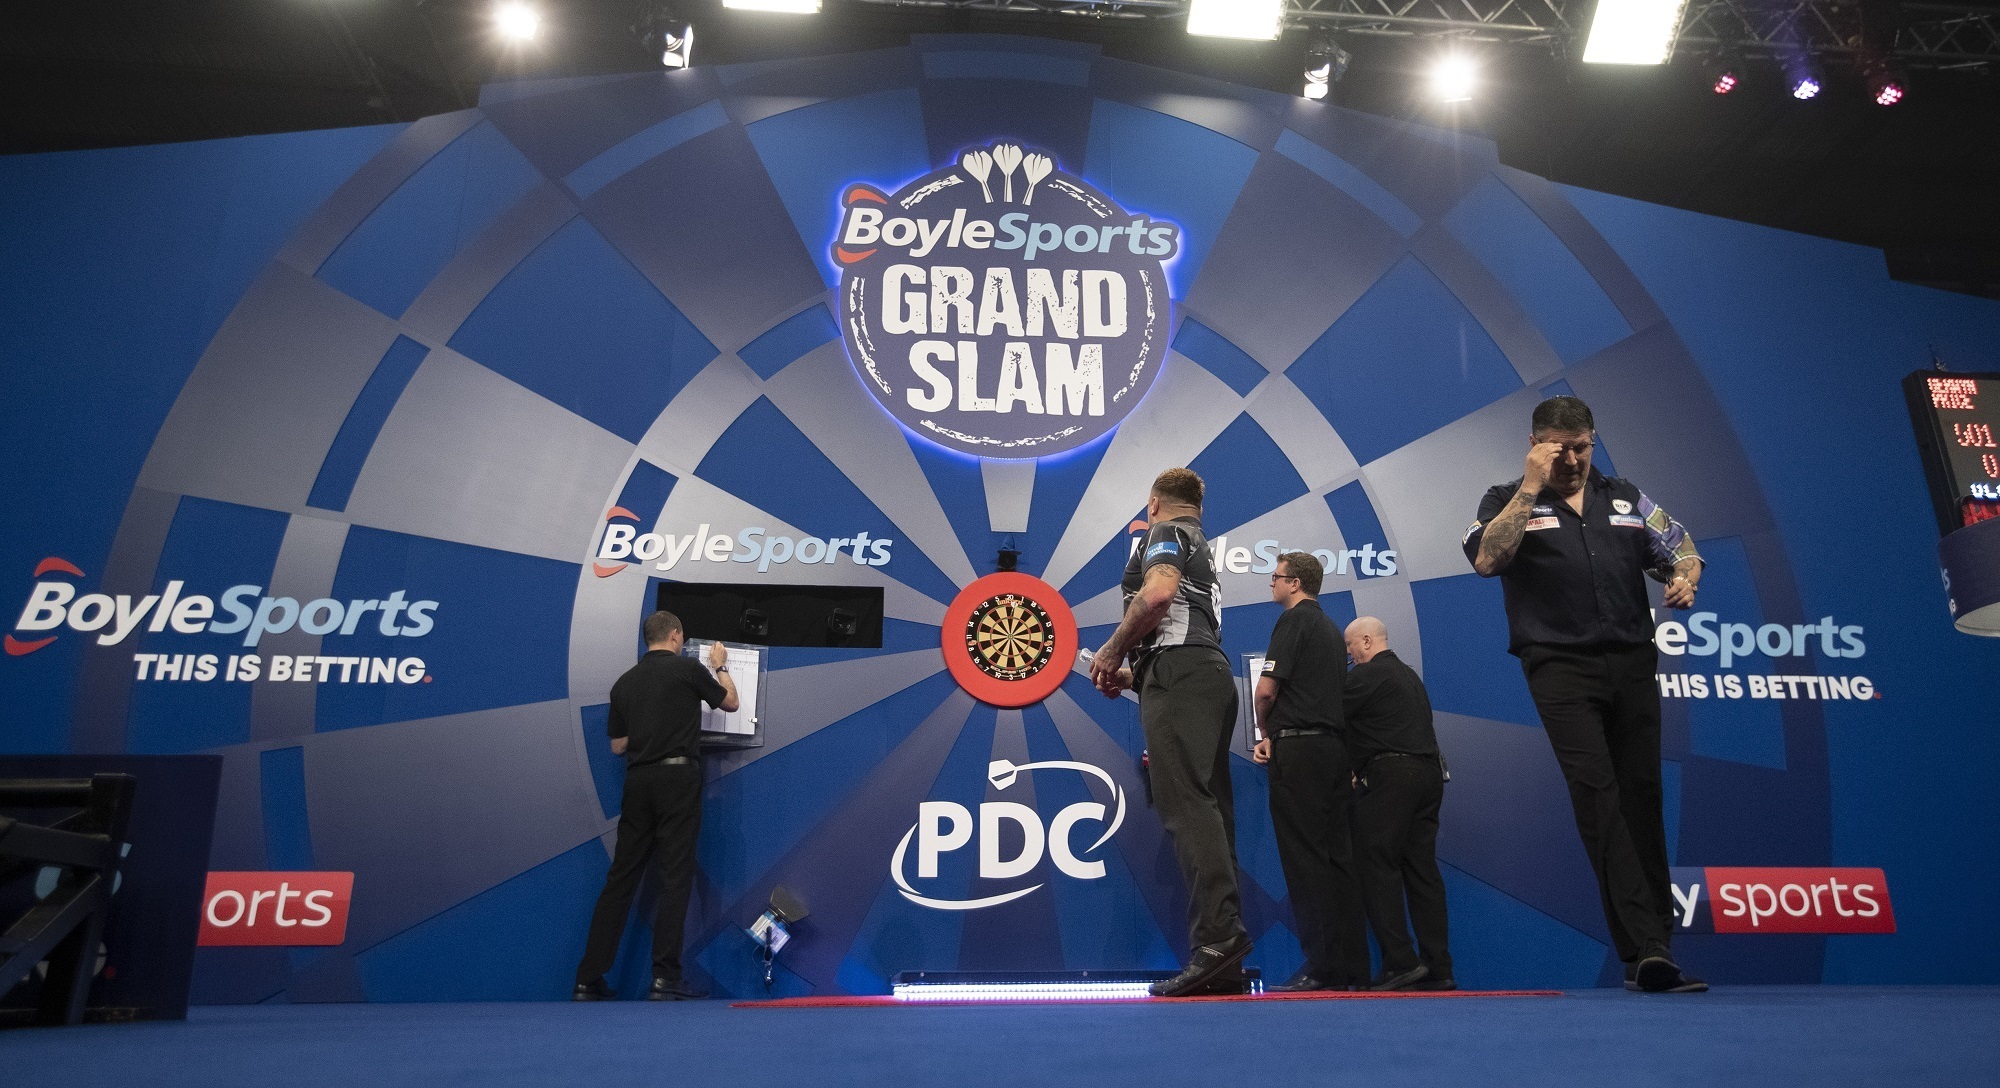 Boylesports betting euro 2021 group burnley brighton betting odds